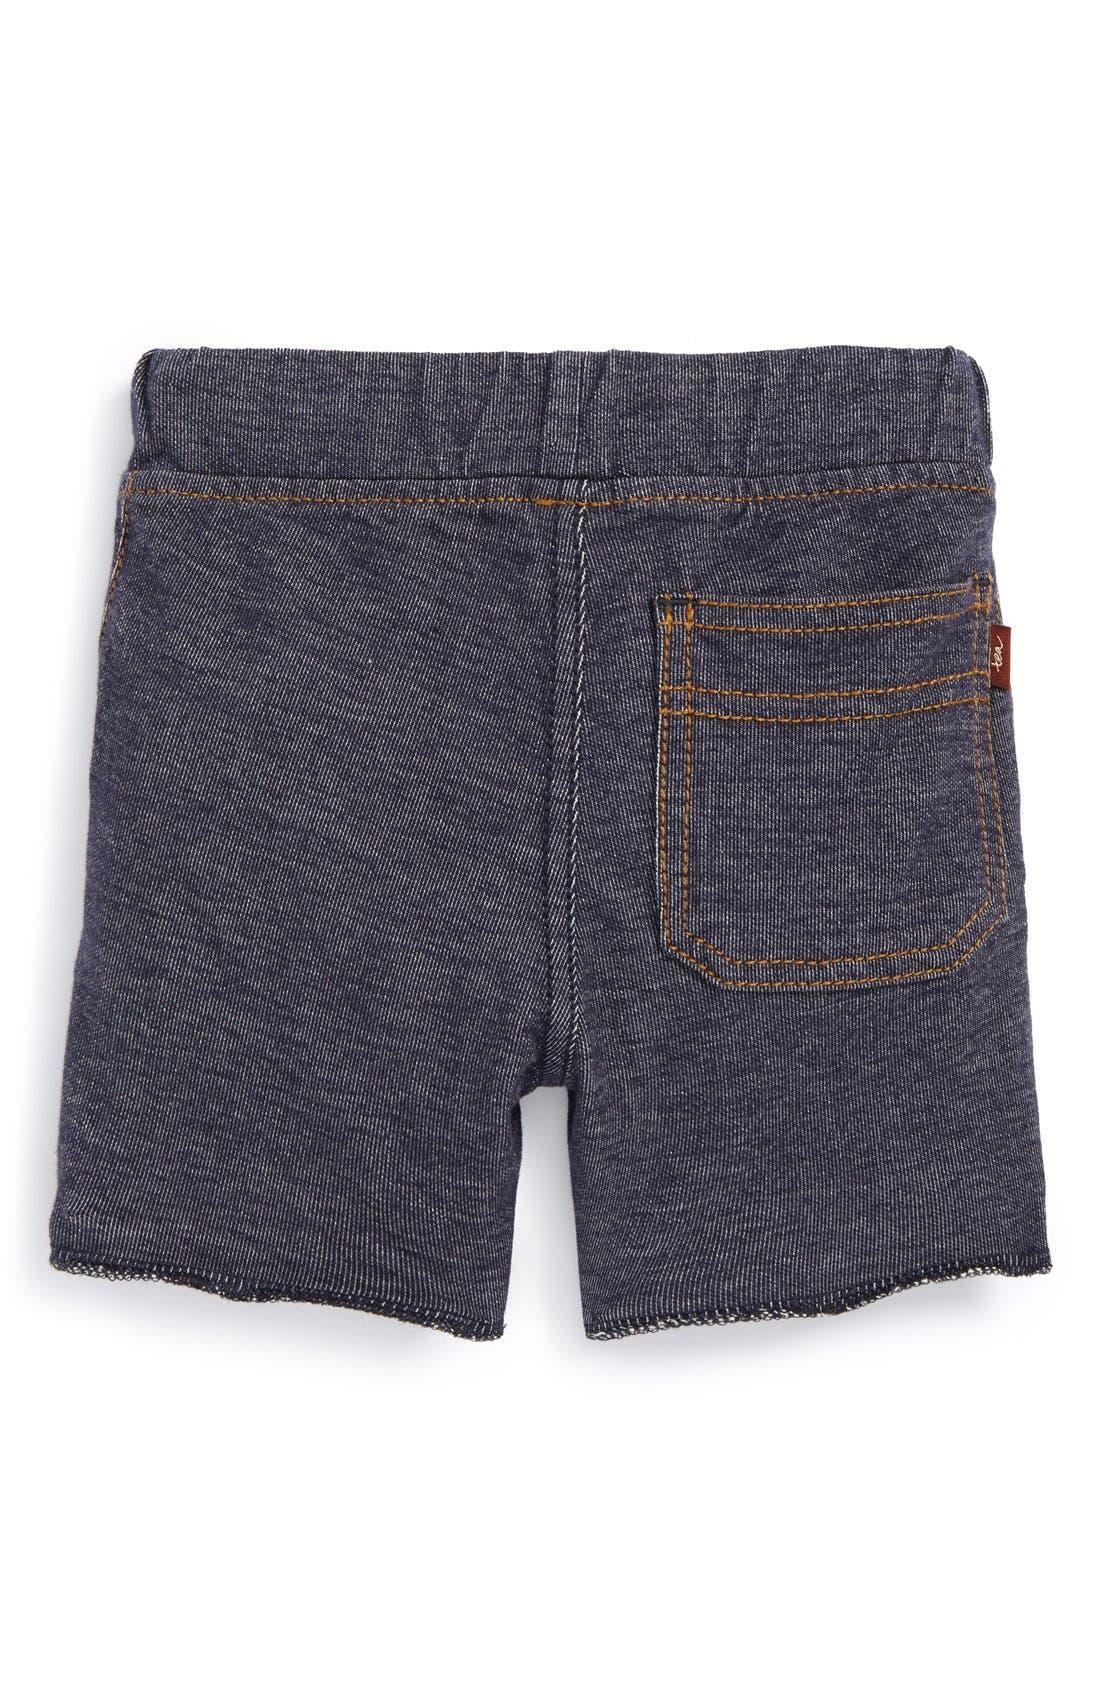 Denim Look Shorts,                             Alternate thumbnail 2, color,                             Indigo